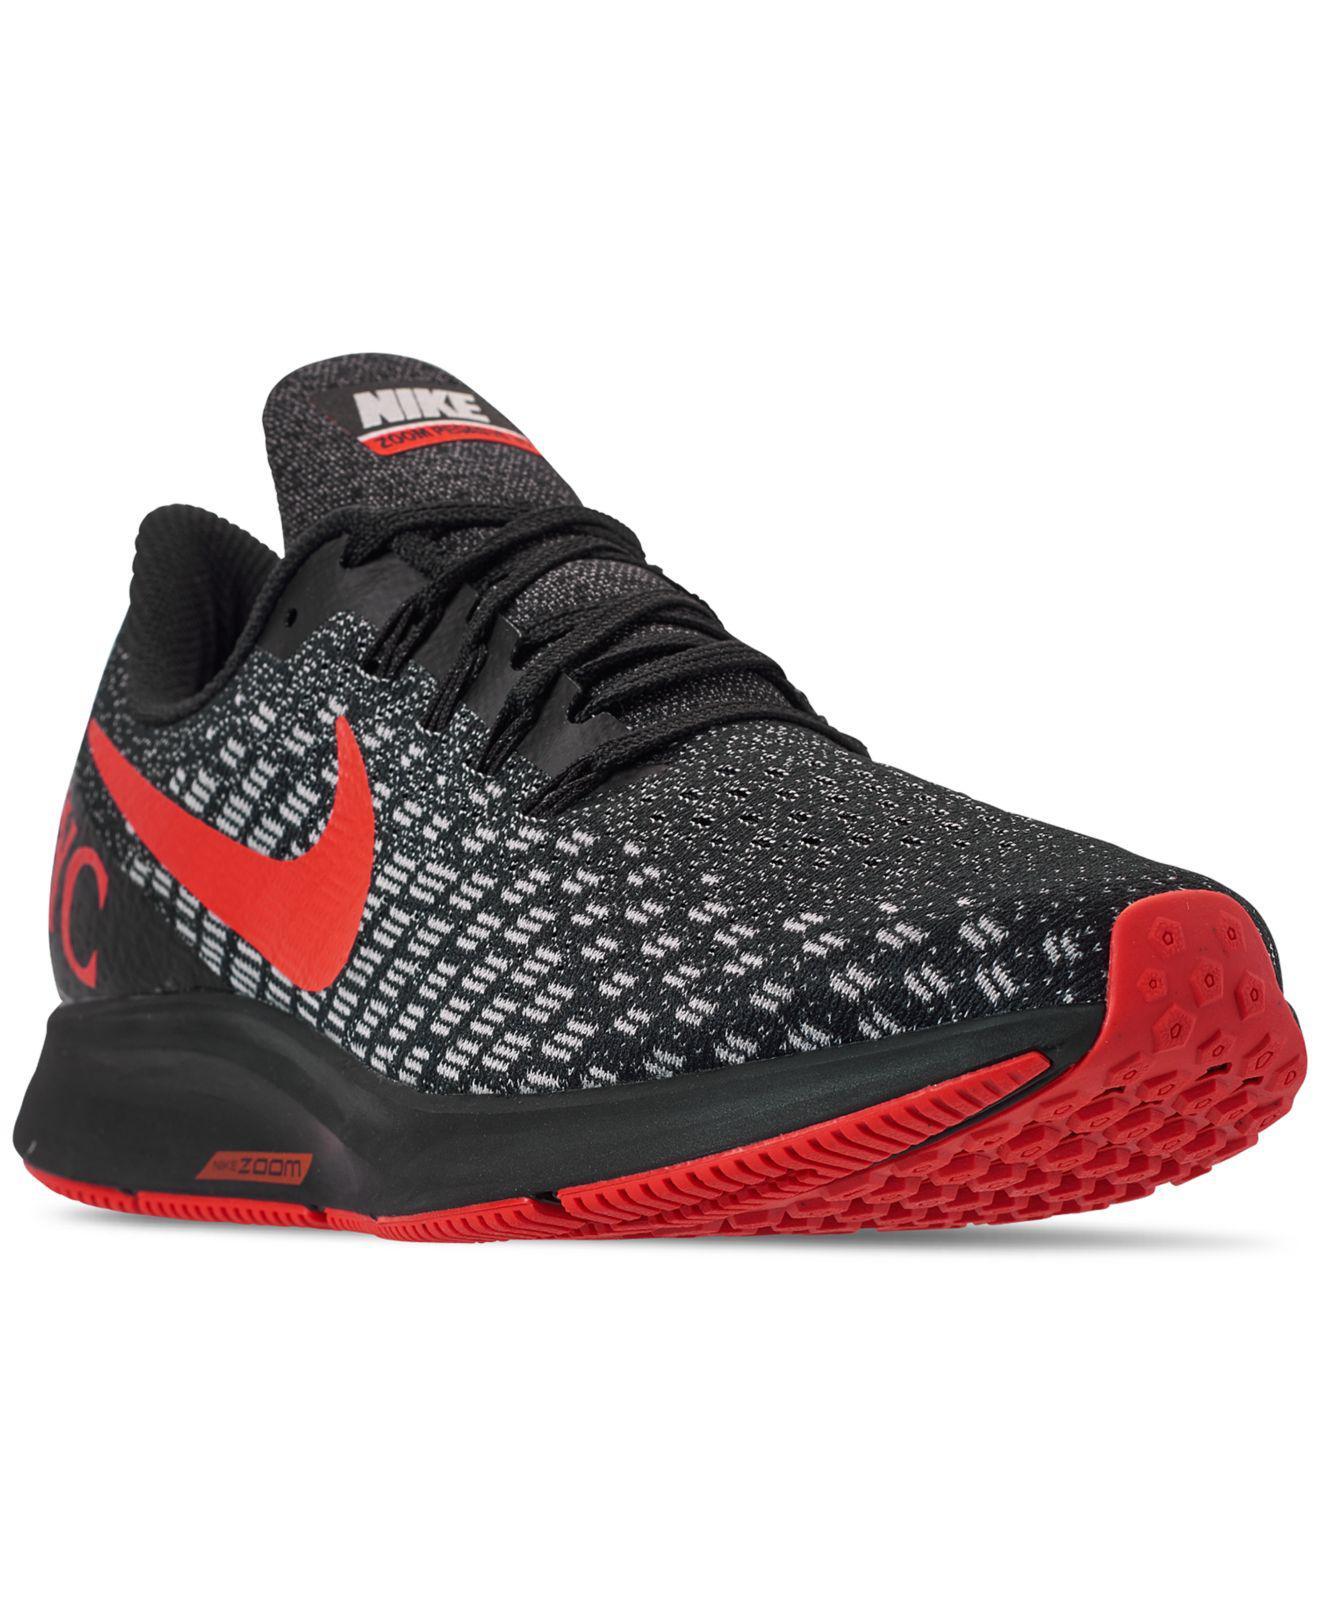 32c1d8aabe21b Lyst - Nike Air Zoom Pegasus 35 Nyc Marathon Running Sneakers From ...